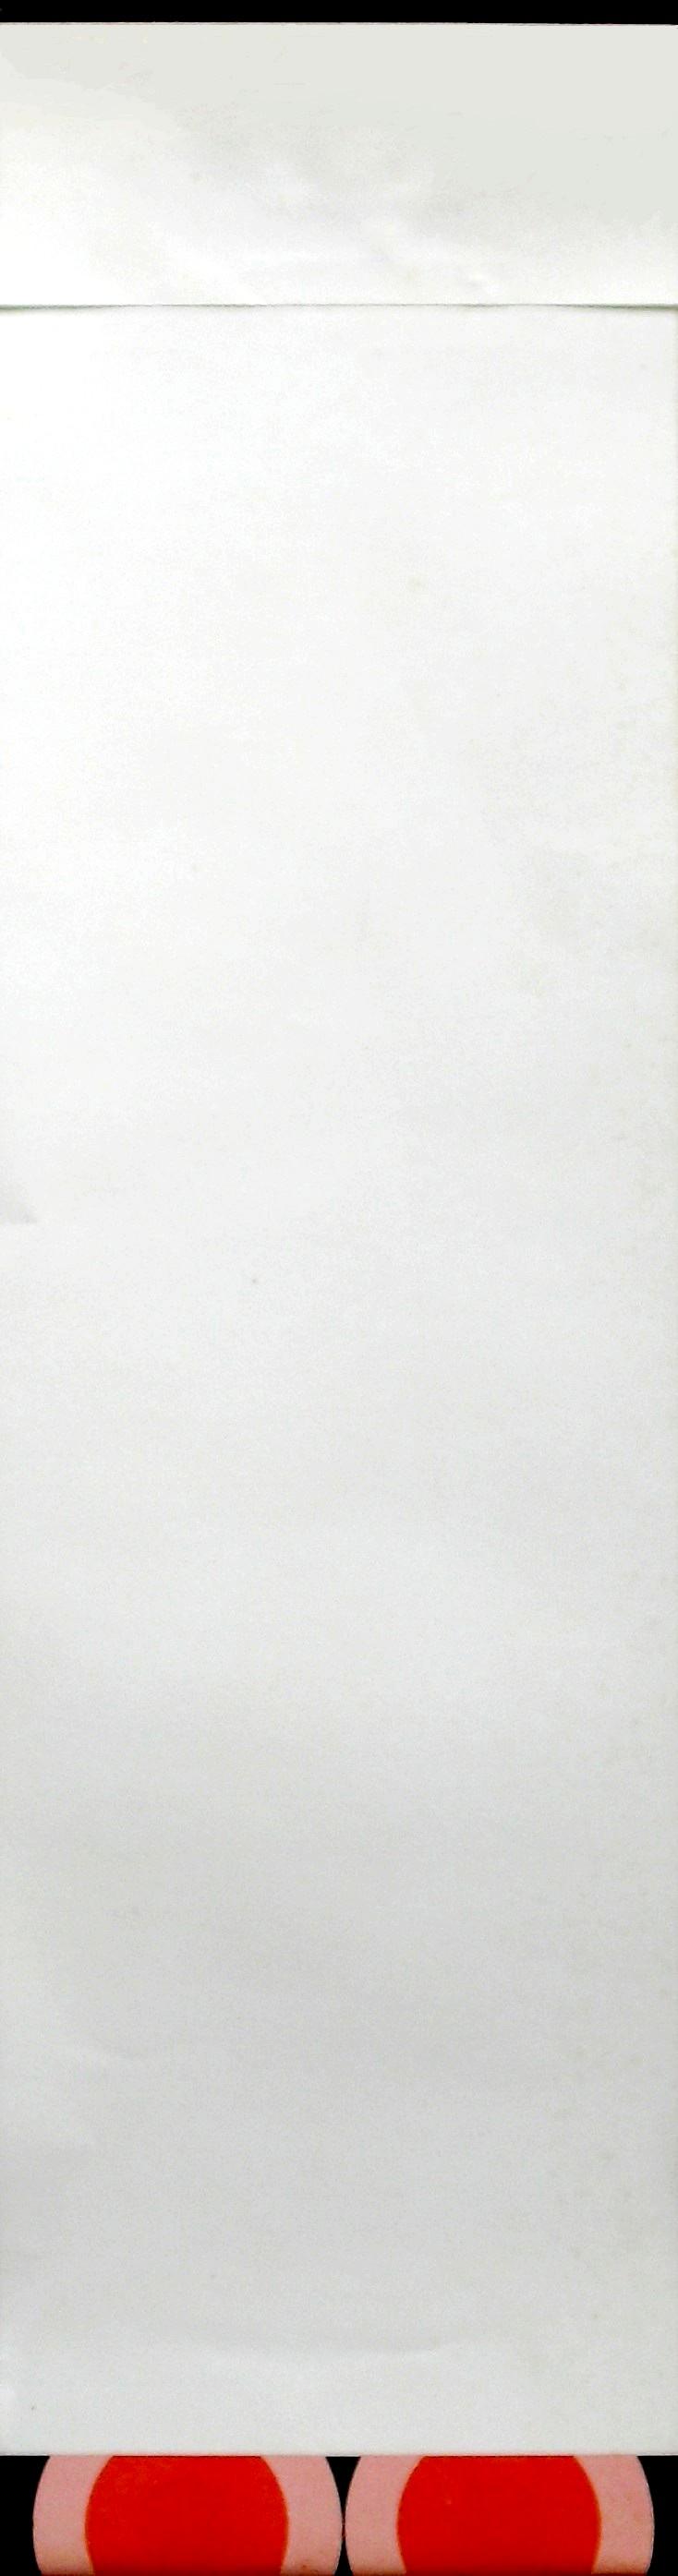 ON STAGE - FEBRUARY, 1970 02obirscnzec